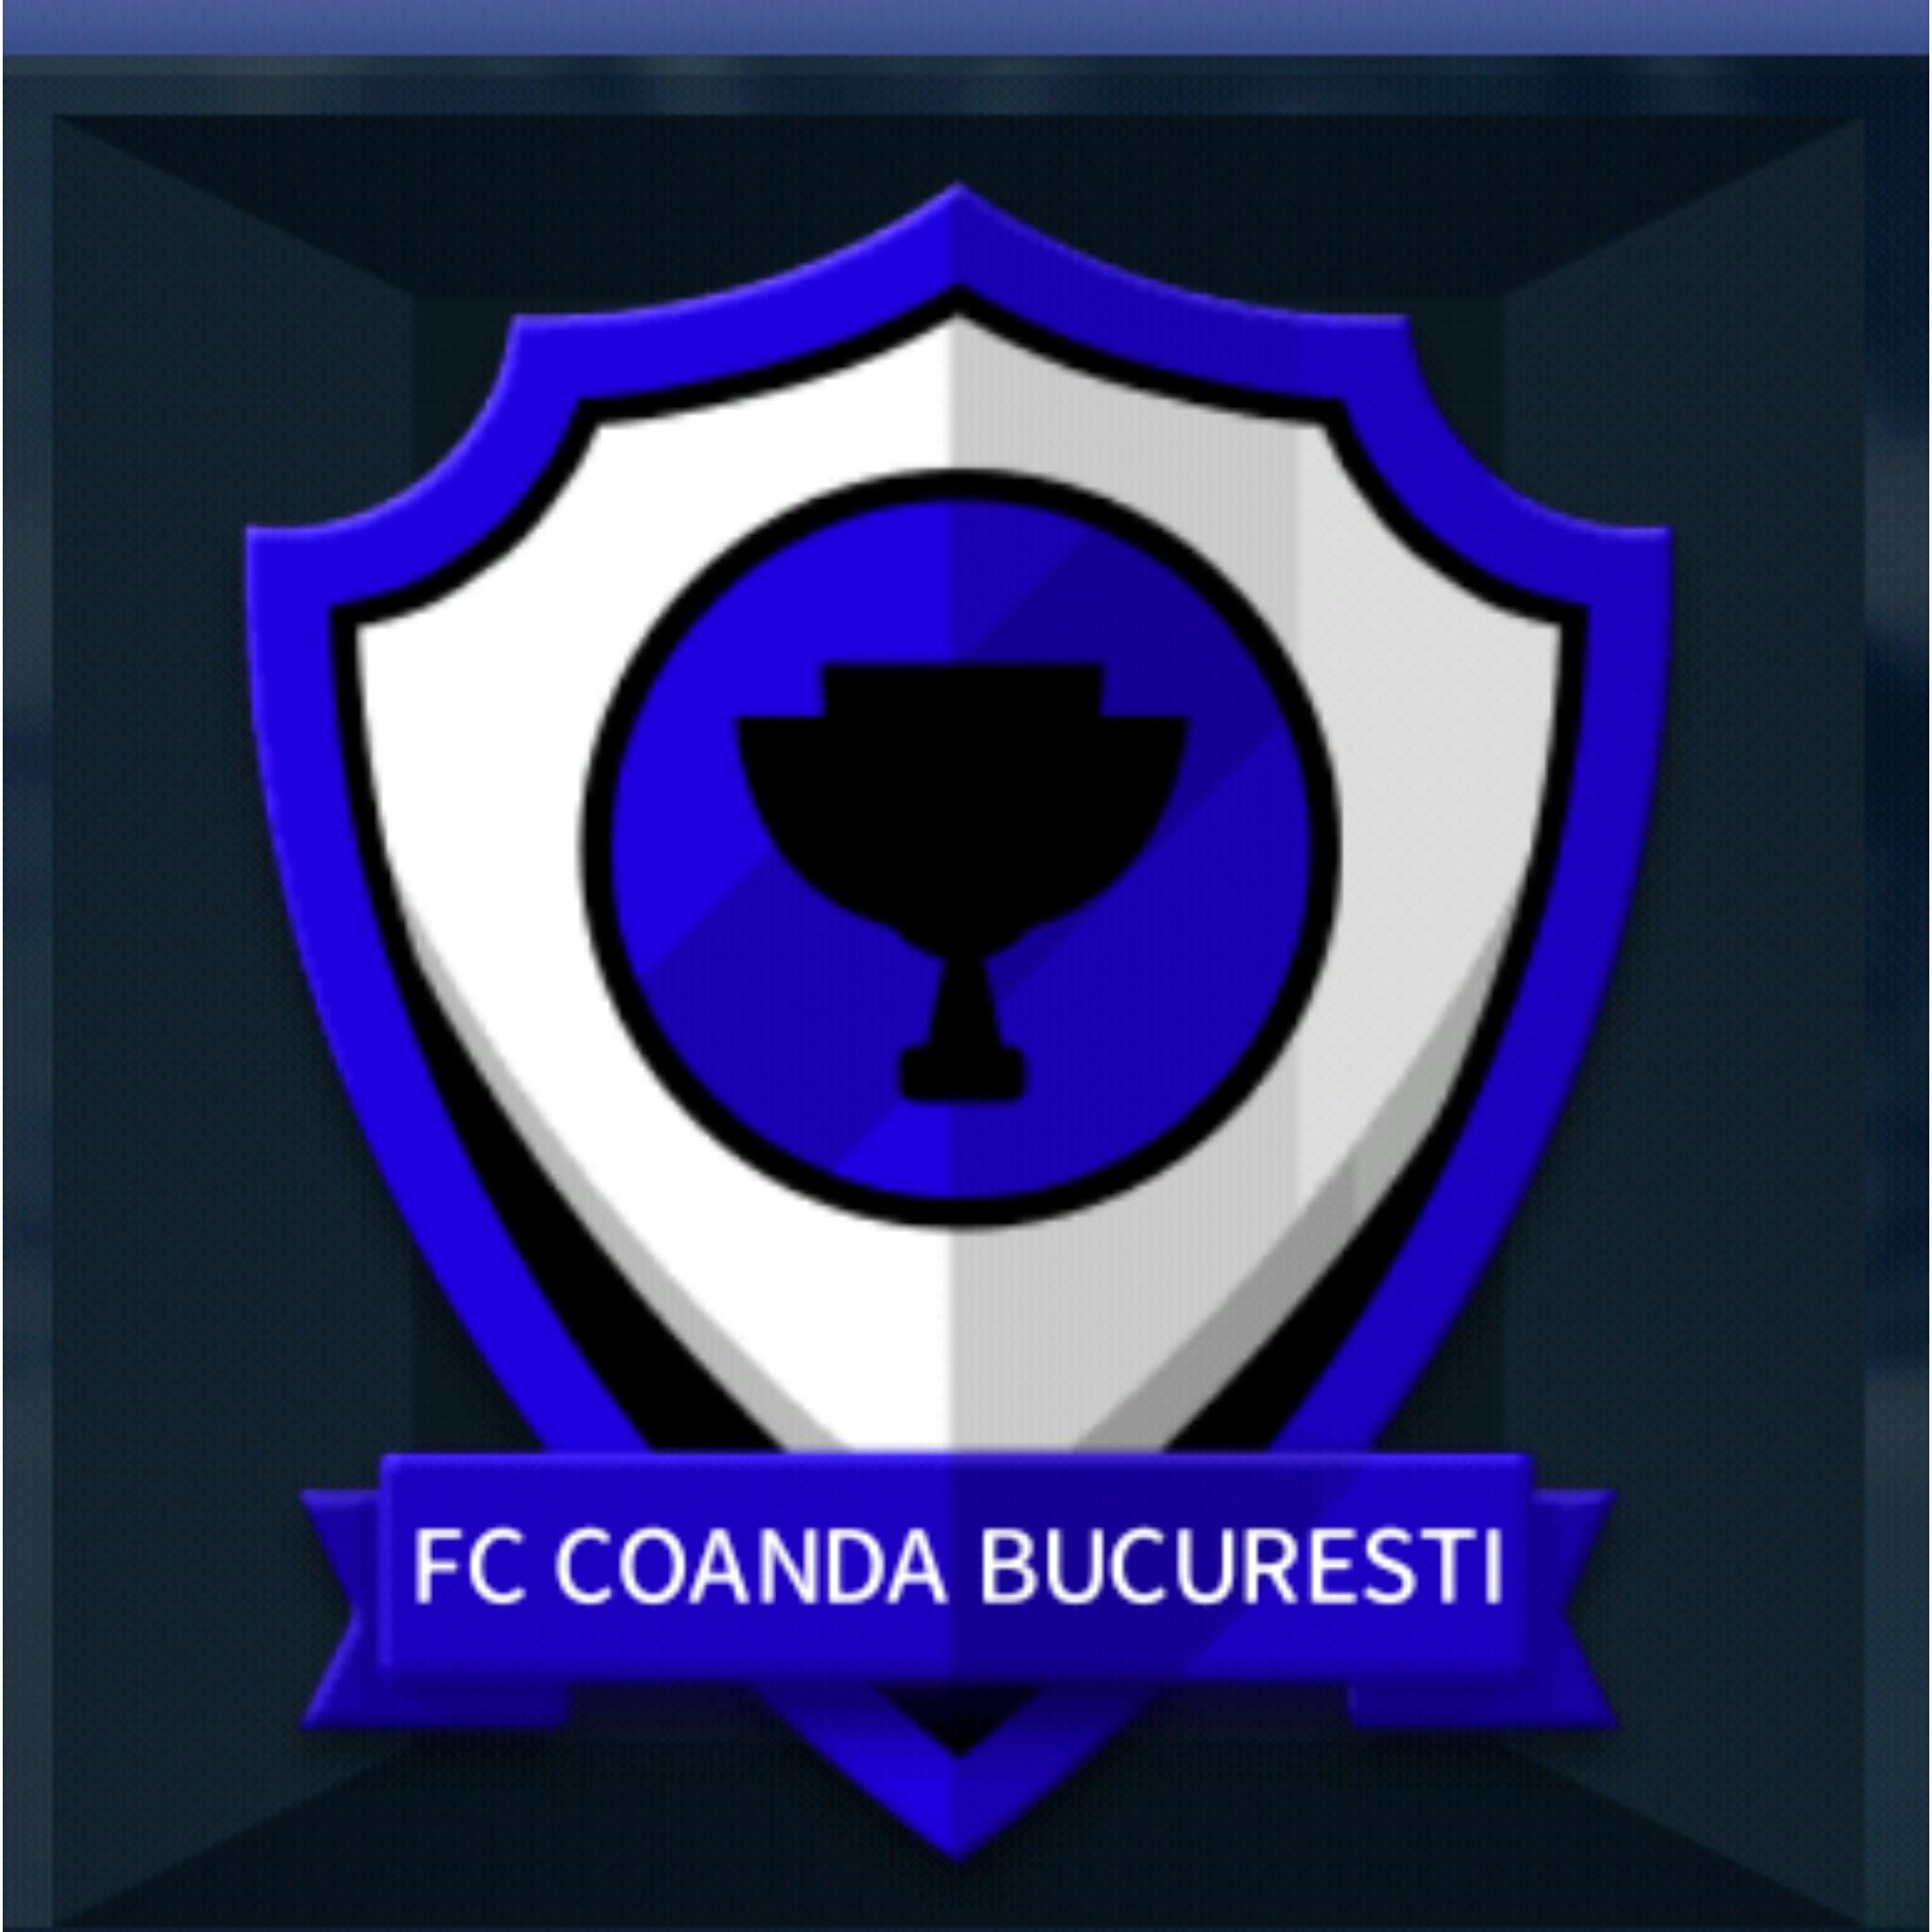 FC COANDA BUCURESTI